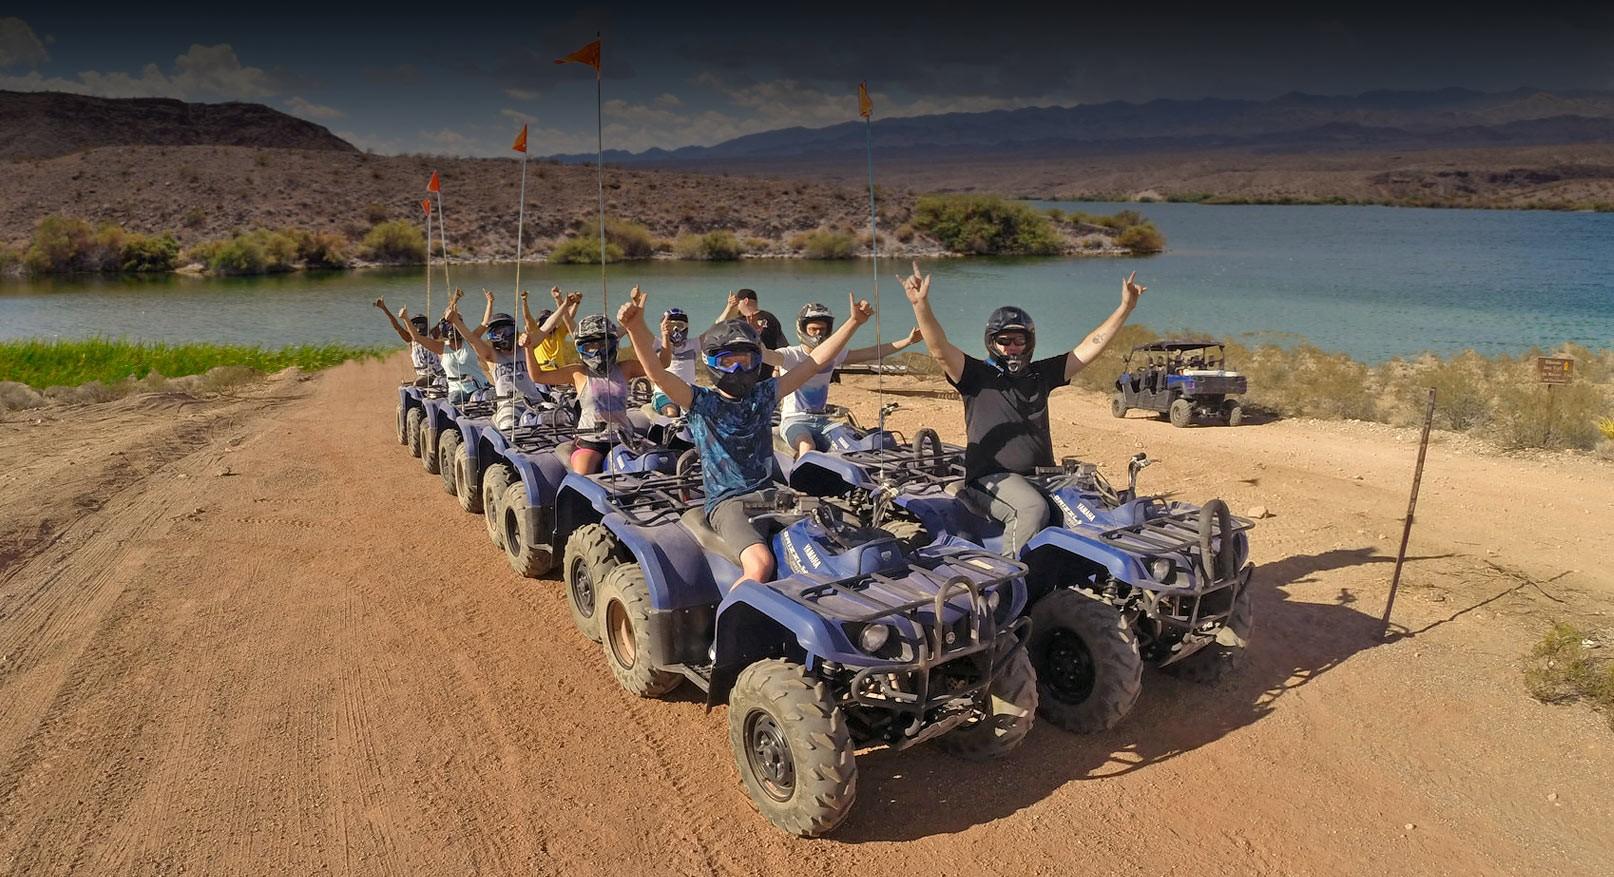 Scenic-Motorized-ATV-Tour